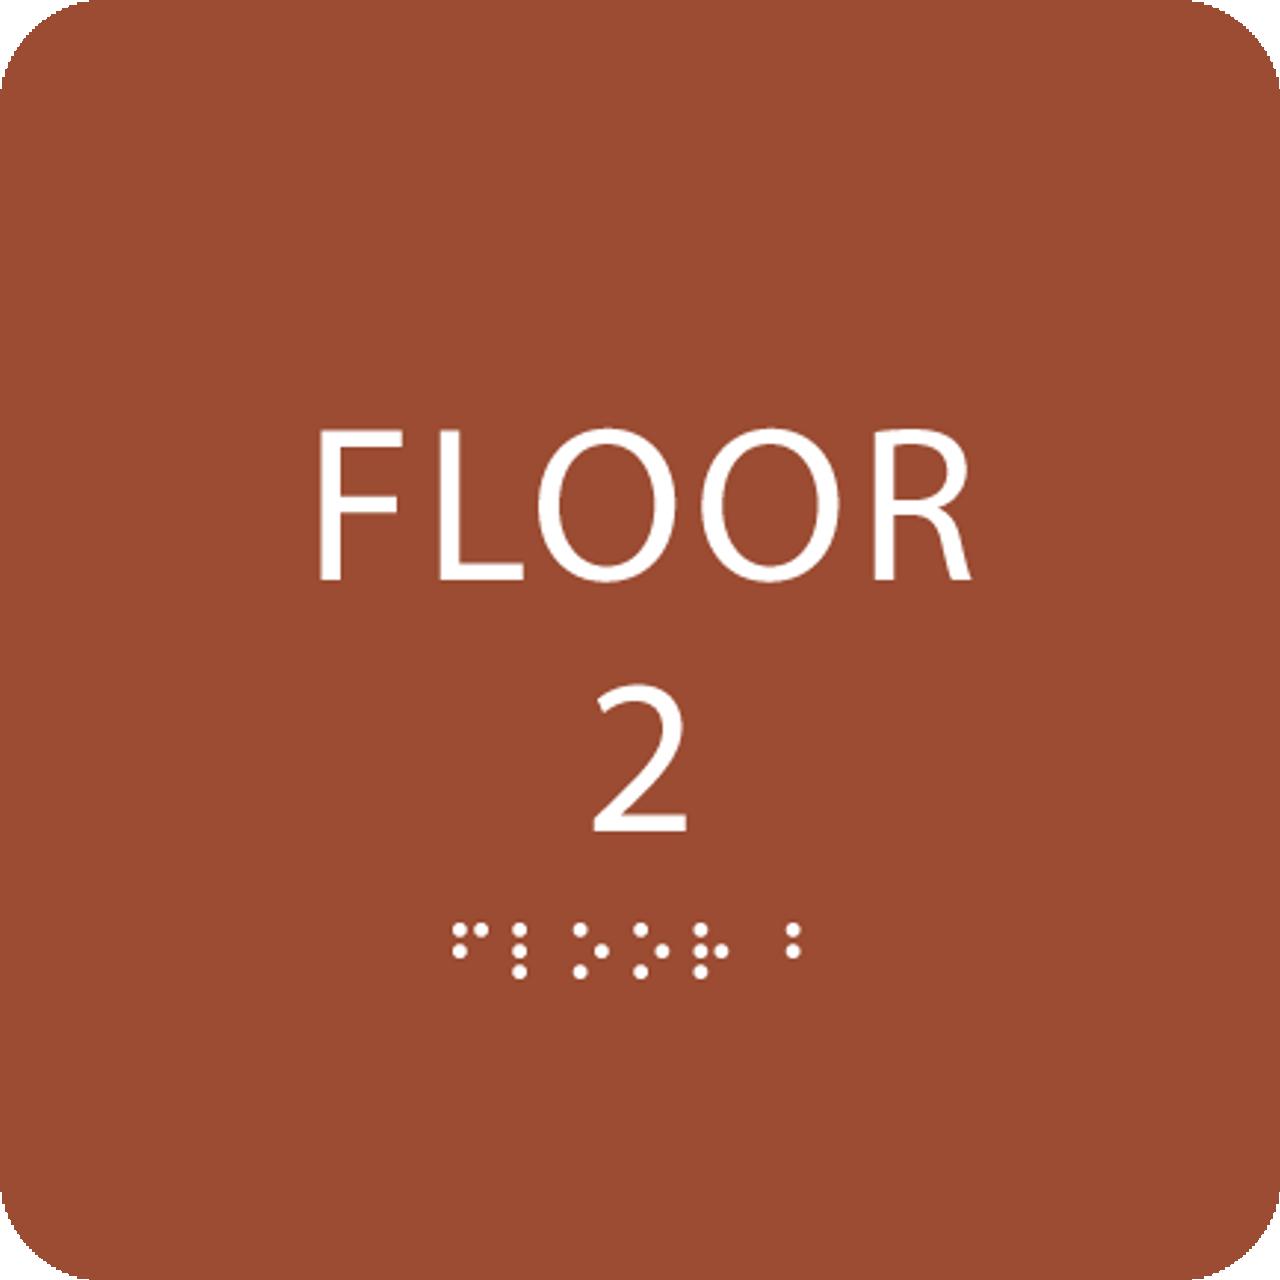 Orange Floor 2 Identification Sign